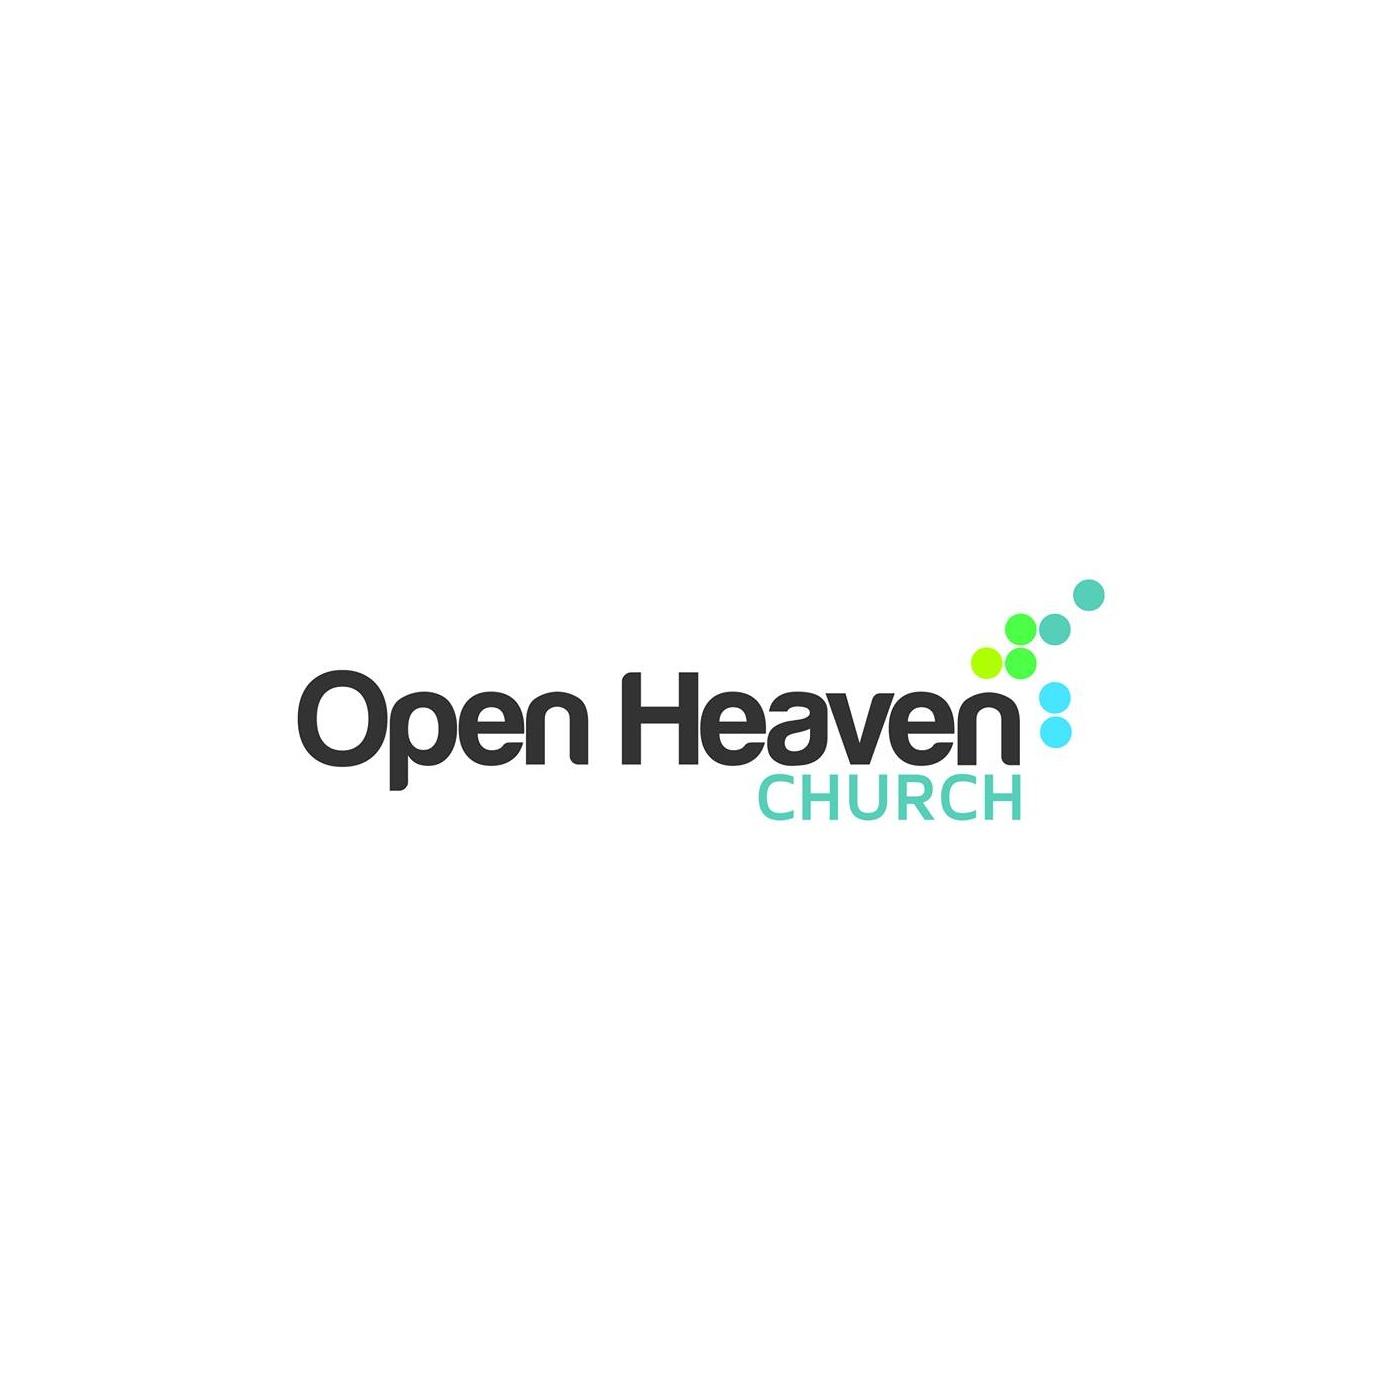 Open Heaven Church: Podcasts: Be an Open Heaven